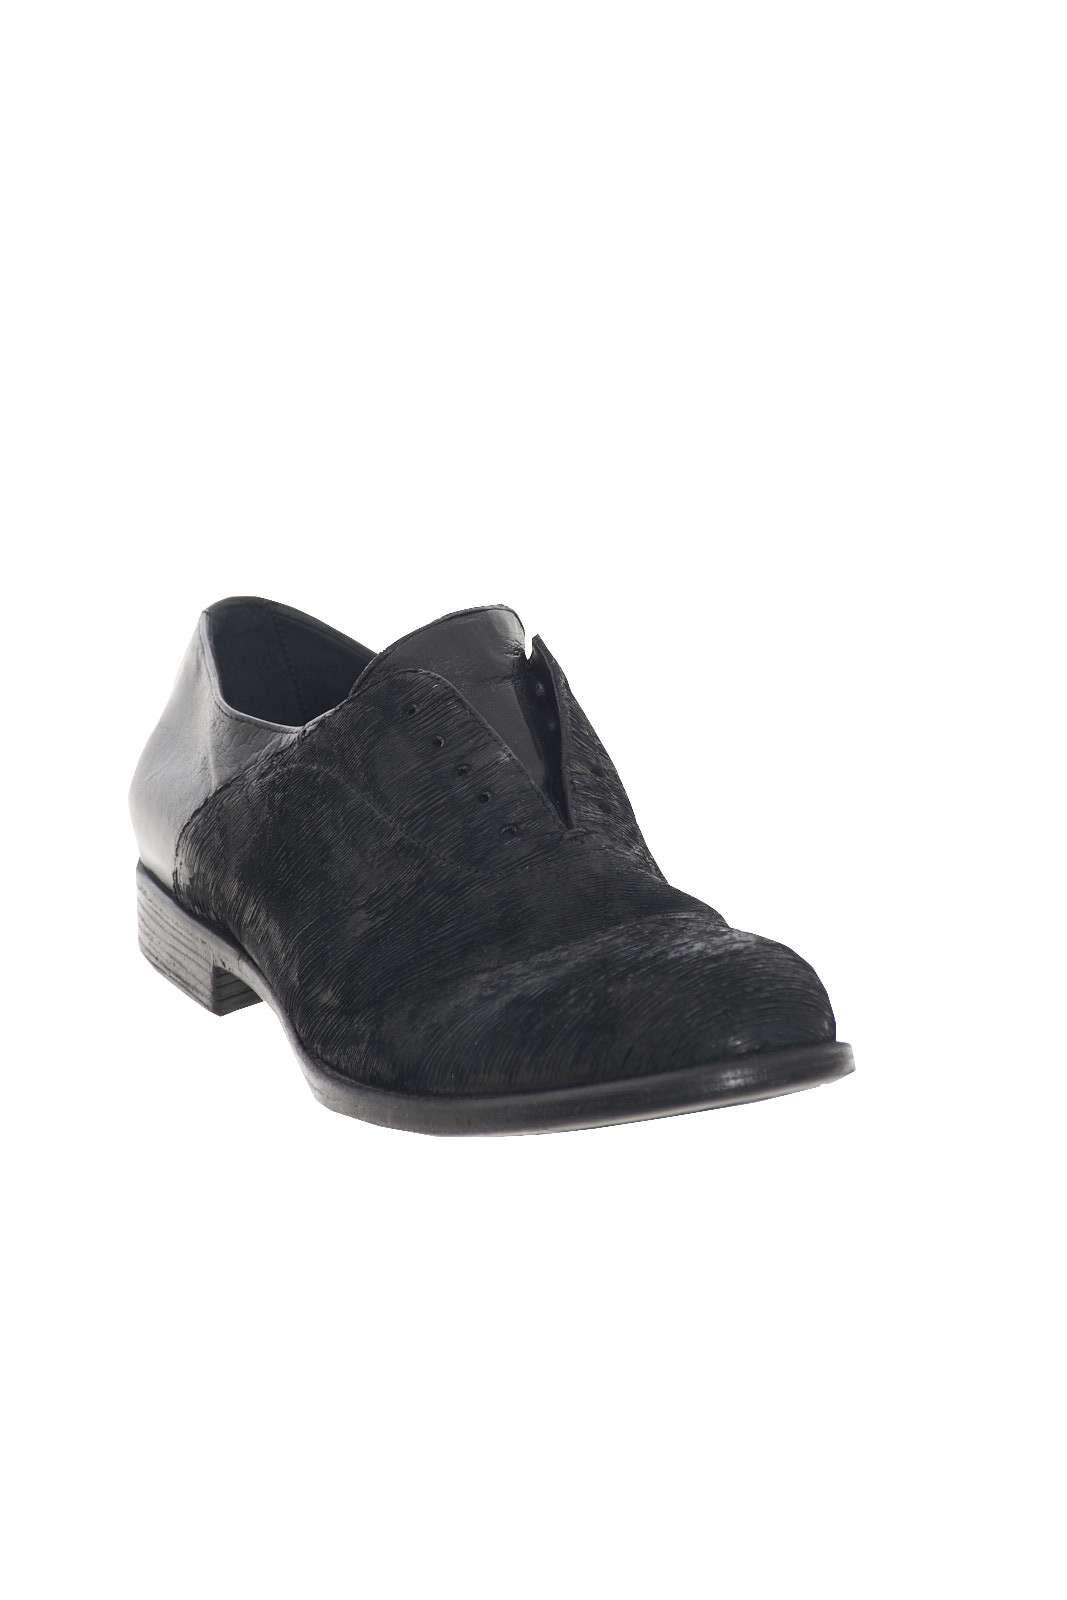 https://www.parmax.com/media/catalog/product/a/i/AI-outlet_parmax-scarpe-uomo-Hundred-100-M087-B.jpg